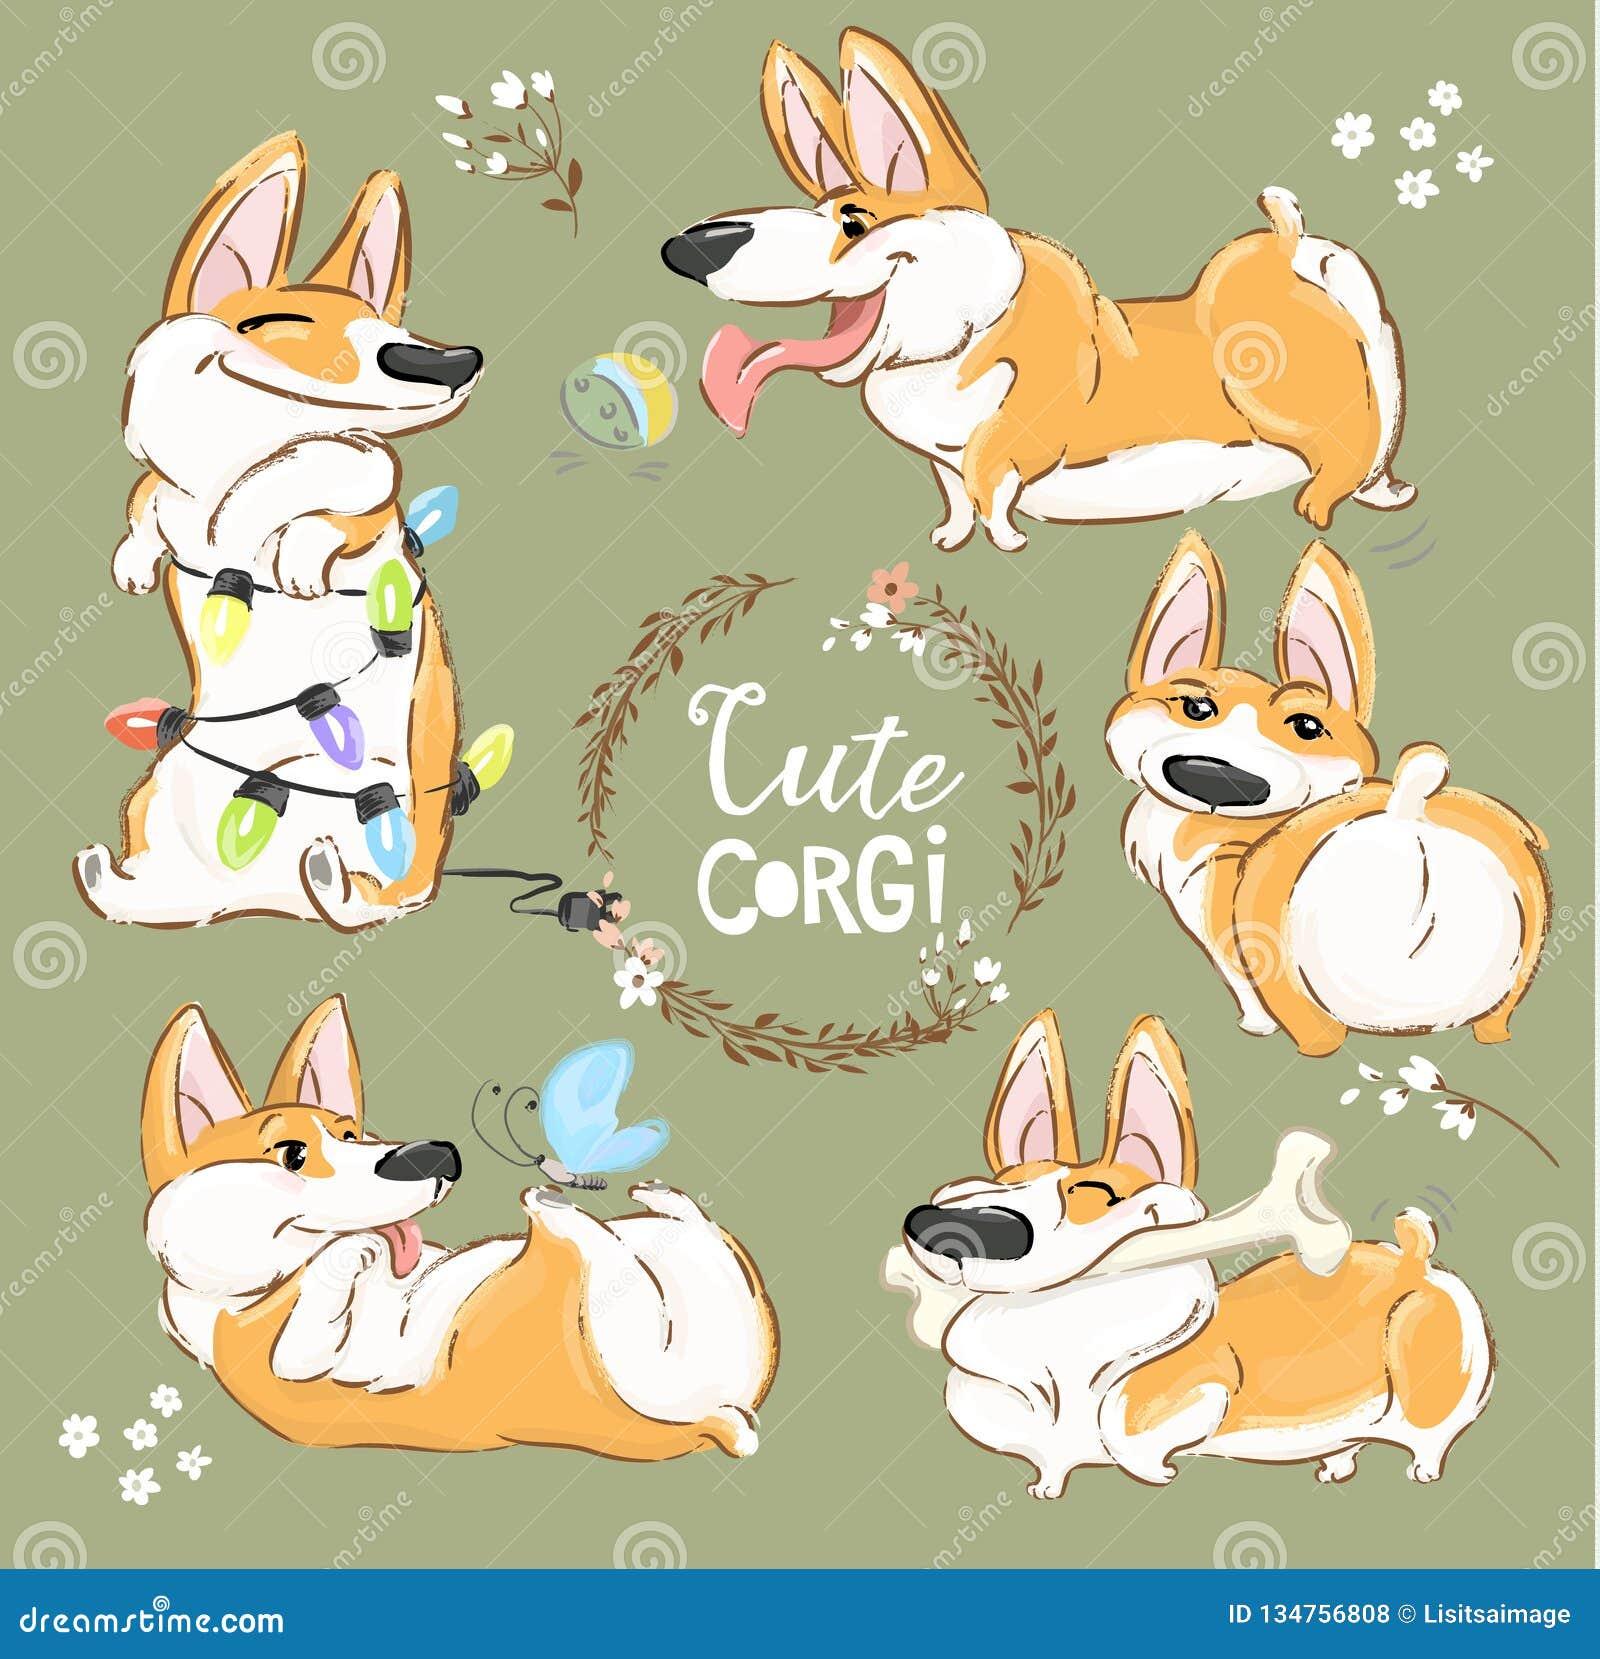 Cute Corgi Dog Character Cartoon Vector Set. Funny Short Fox Pet Group Smile, Play with Ball and Bone. Cheerful Happy